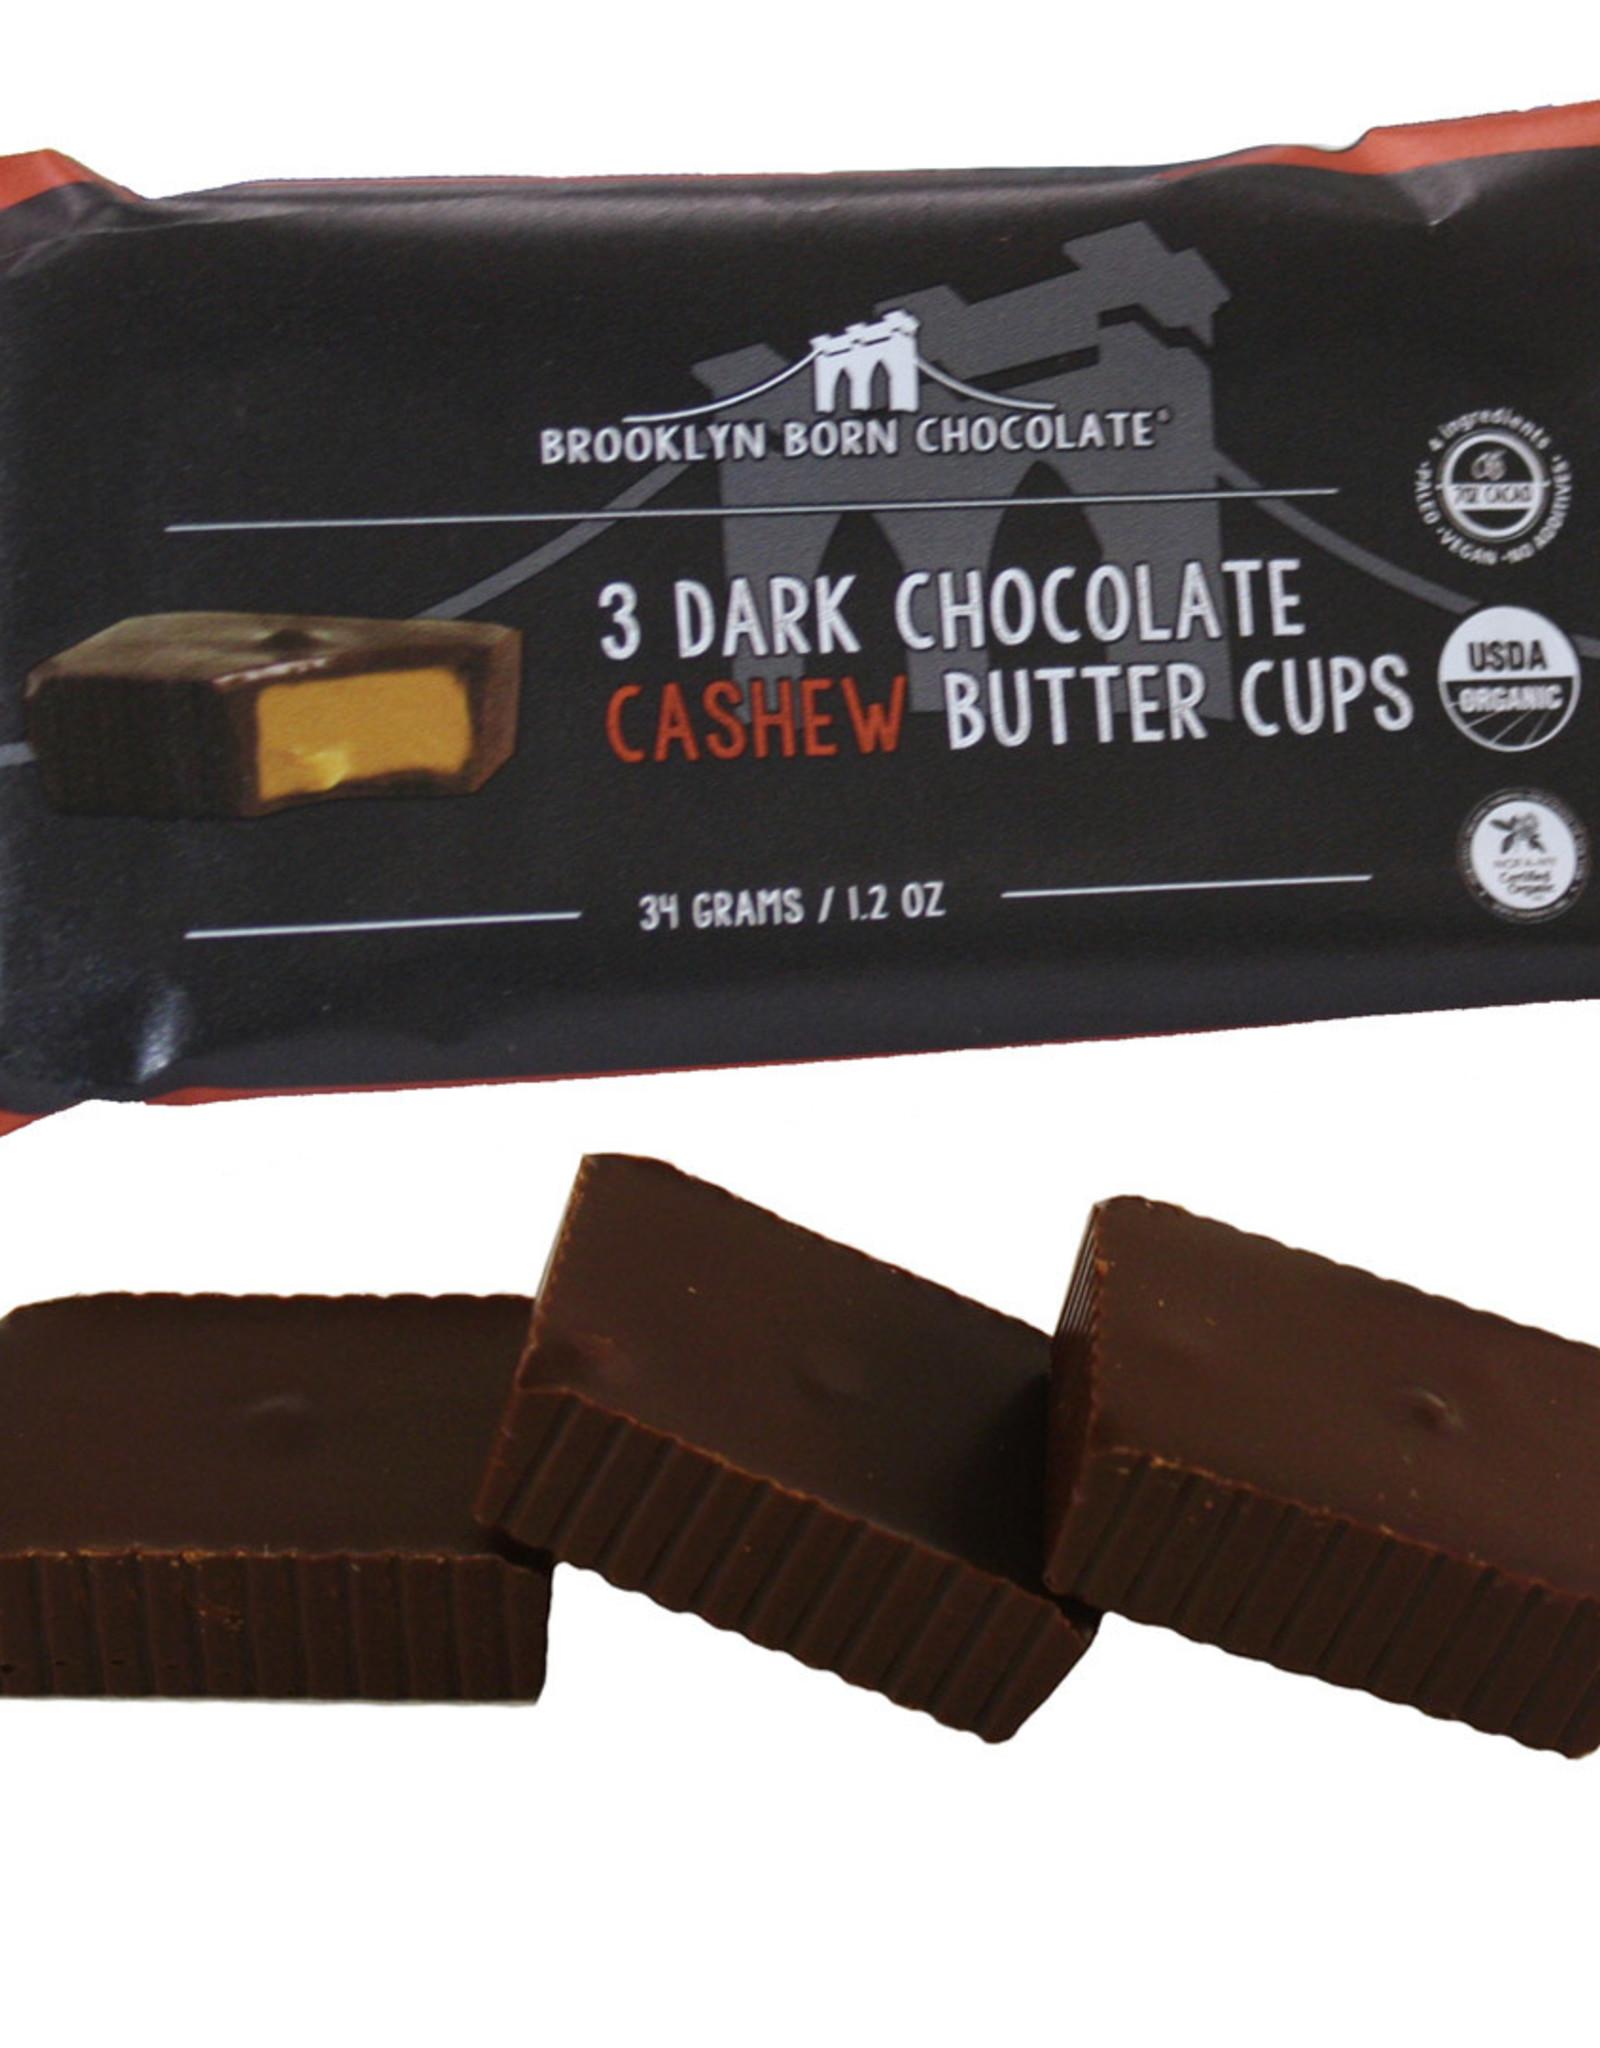 Brooklyn Born Chocolate Brooklyn - Cashew Butter Cups, Dark Chocolate (70g)